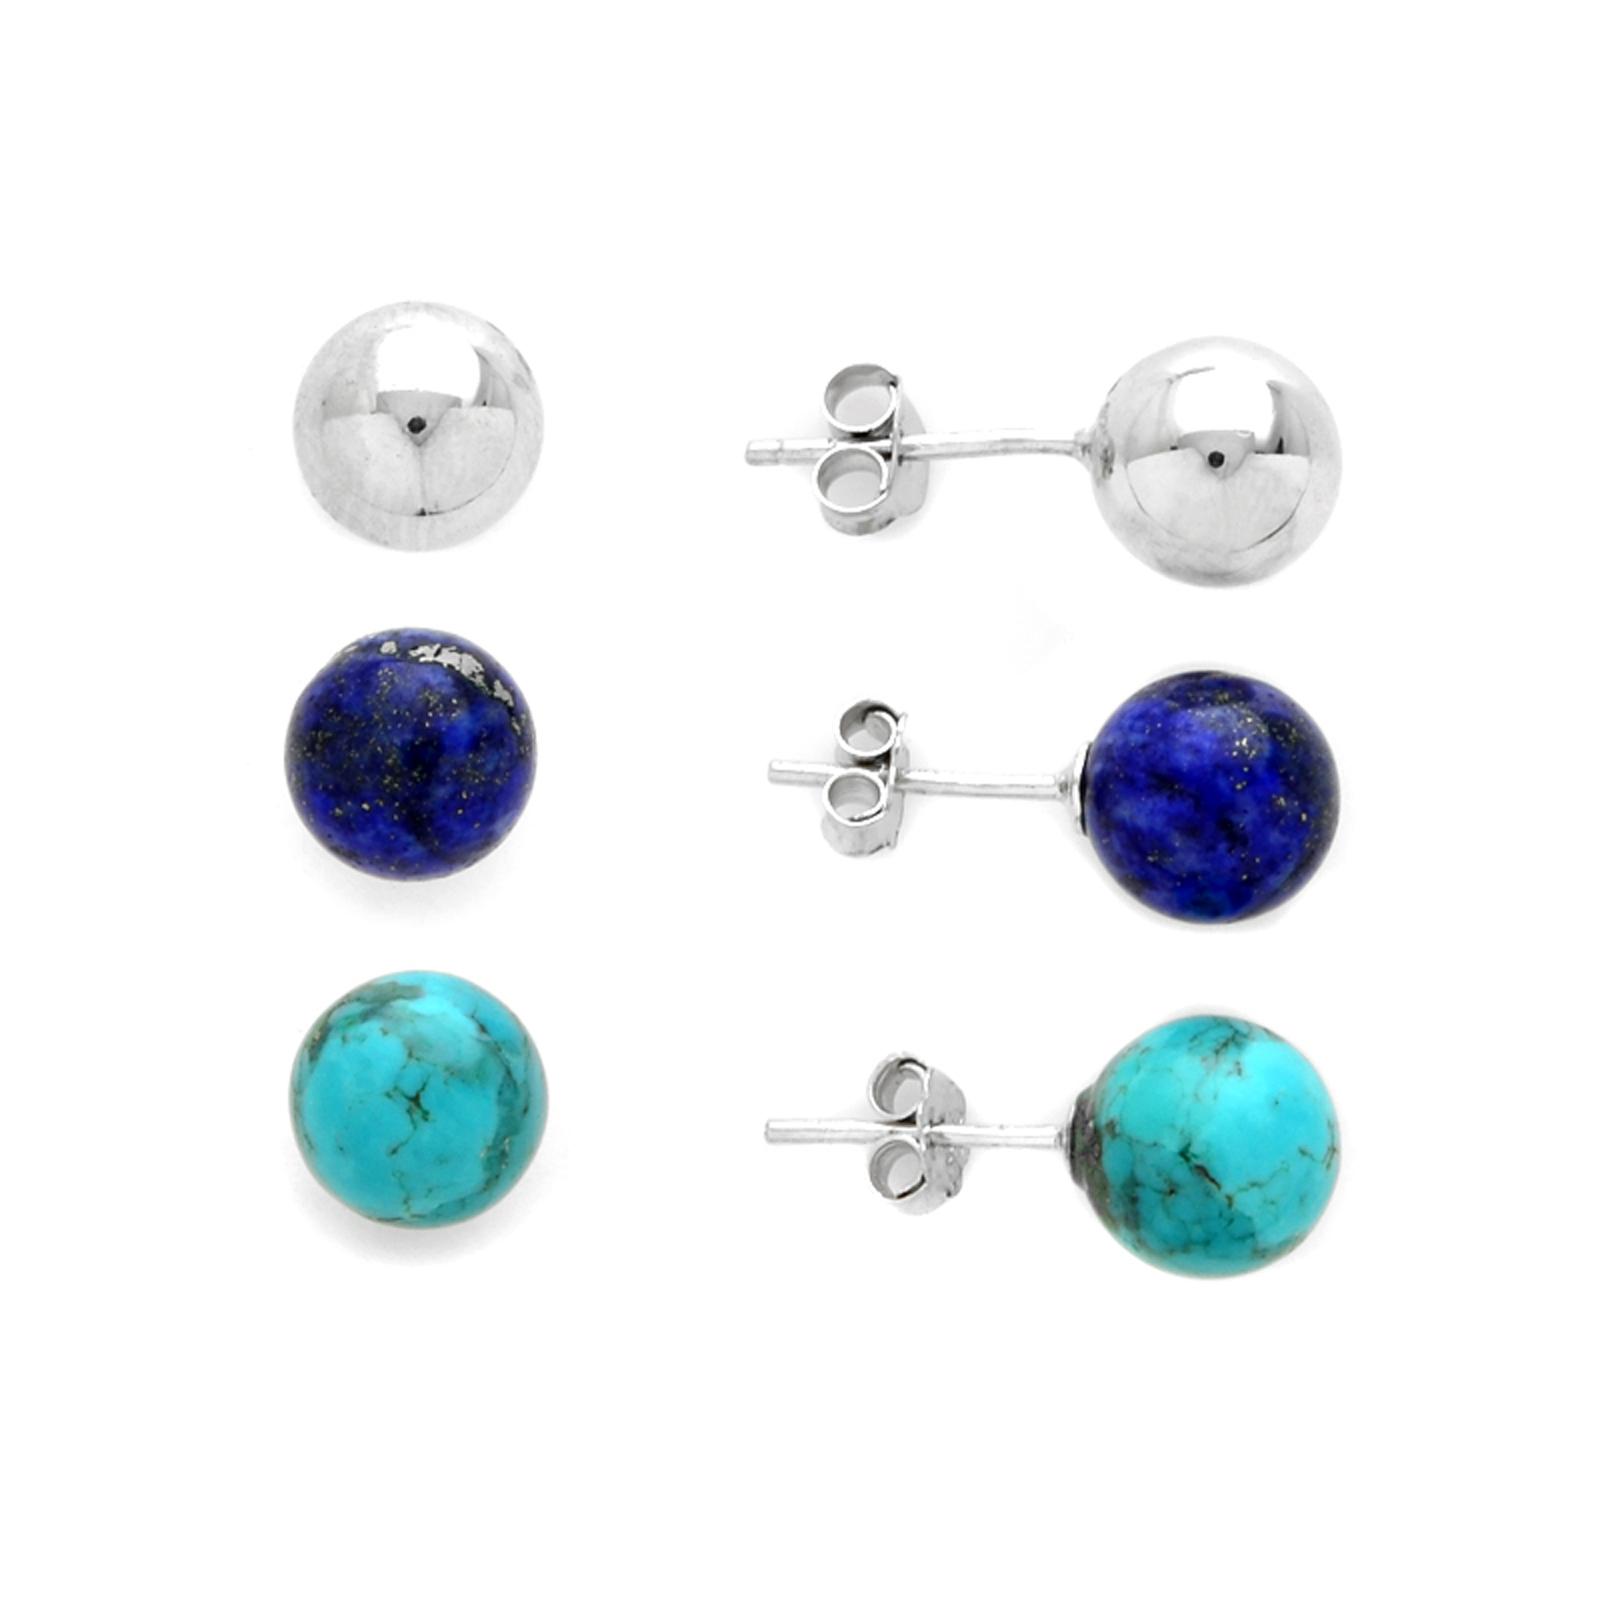 Sterling Silver 3 Pair Earring Set